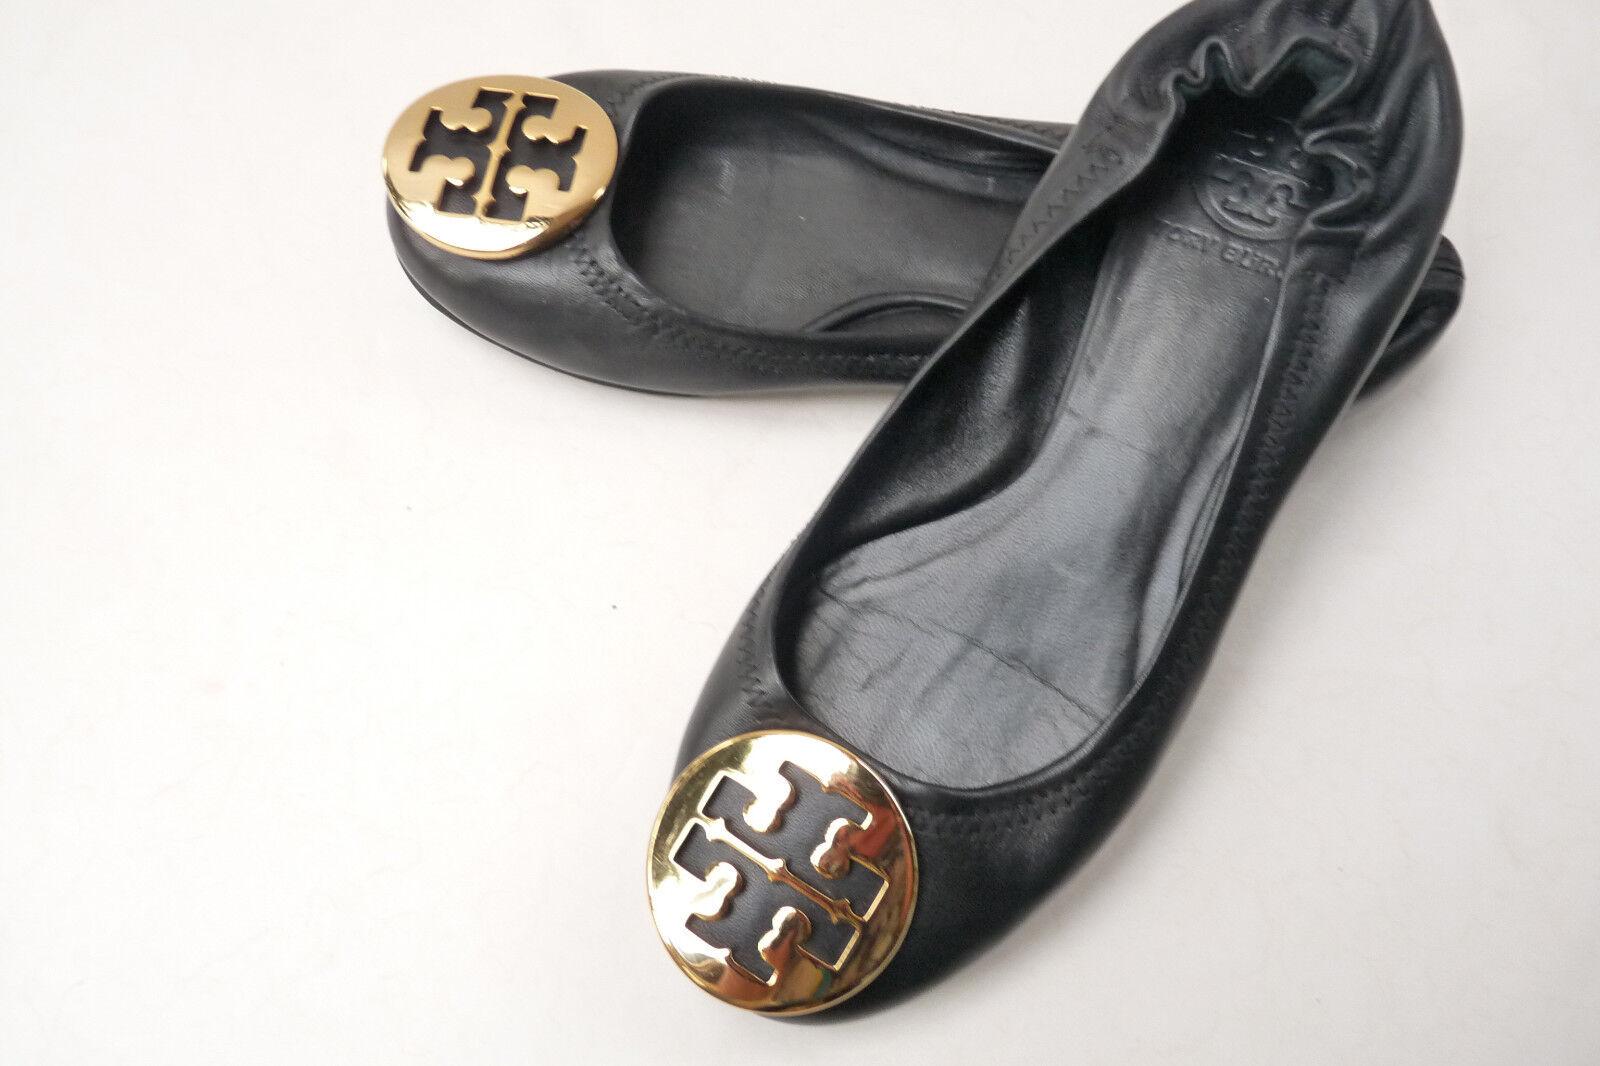 Authentic Tory Burch Reva nero With oro Leather Btuttiet Flats sautope Dimensione 4.5